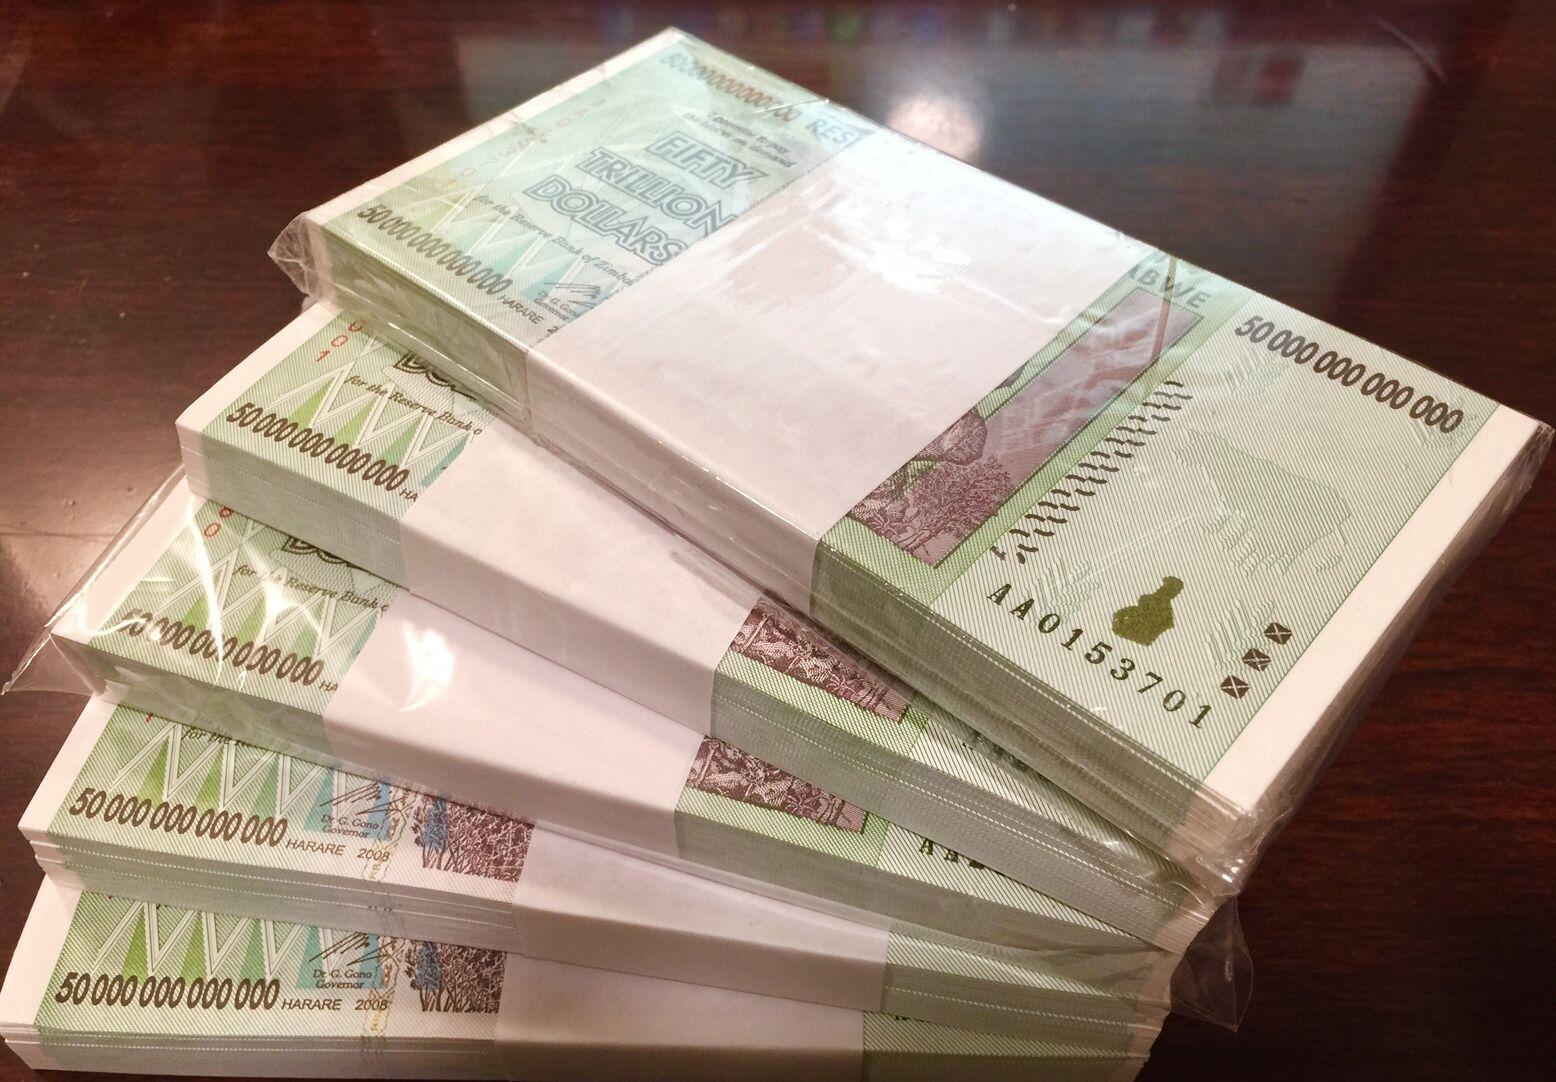 ZIMBABWE 50 TRILLION ZIM DOLLARS 2008 AA P90 UNC 100 NOTES UV INSPECTED WITH COA